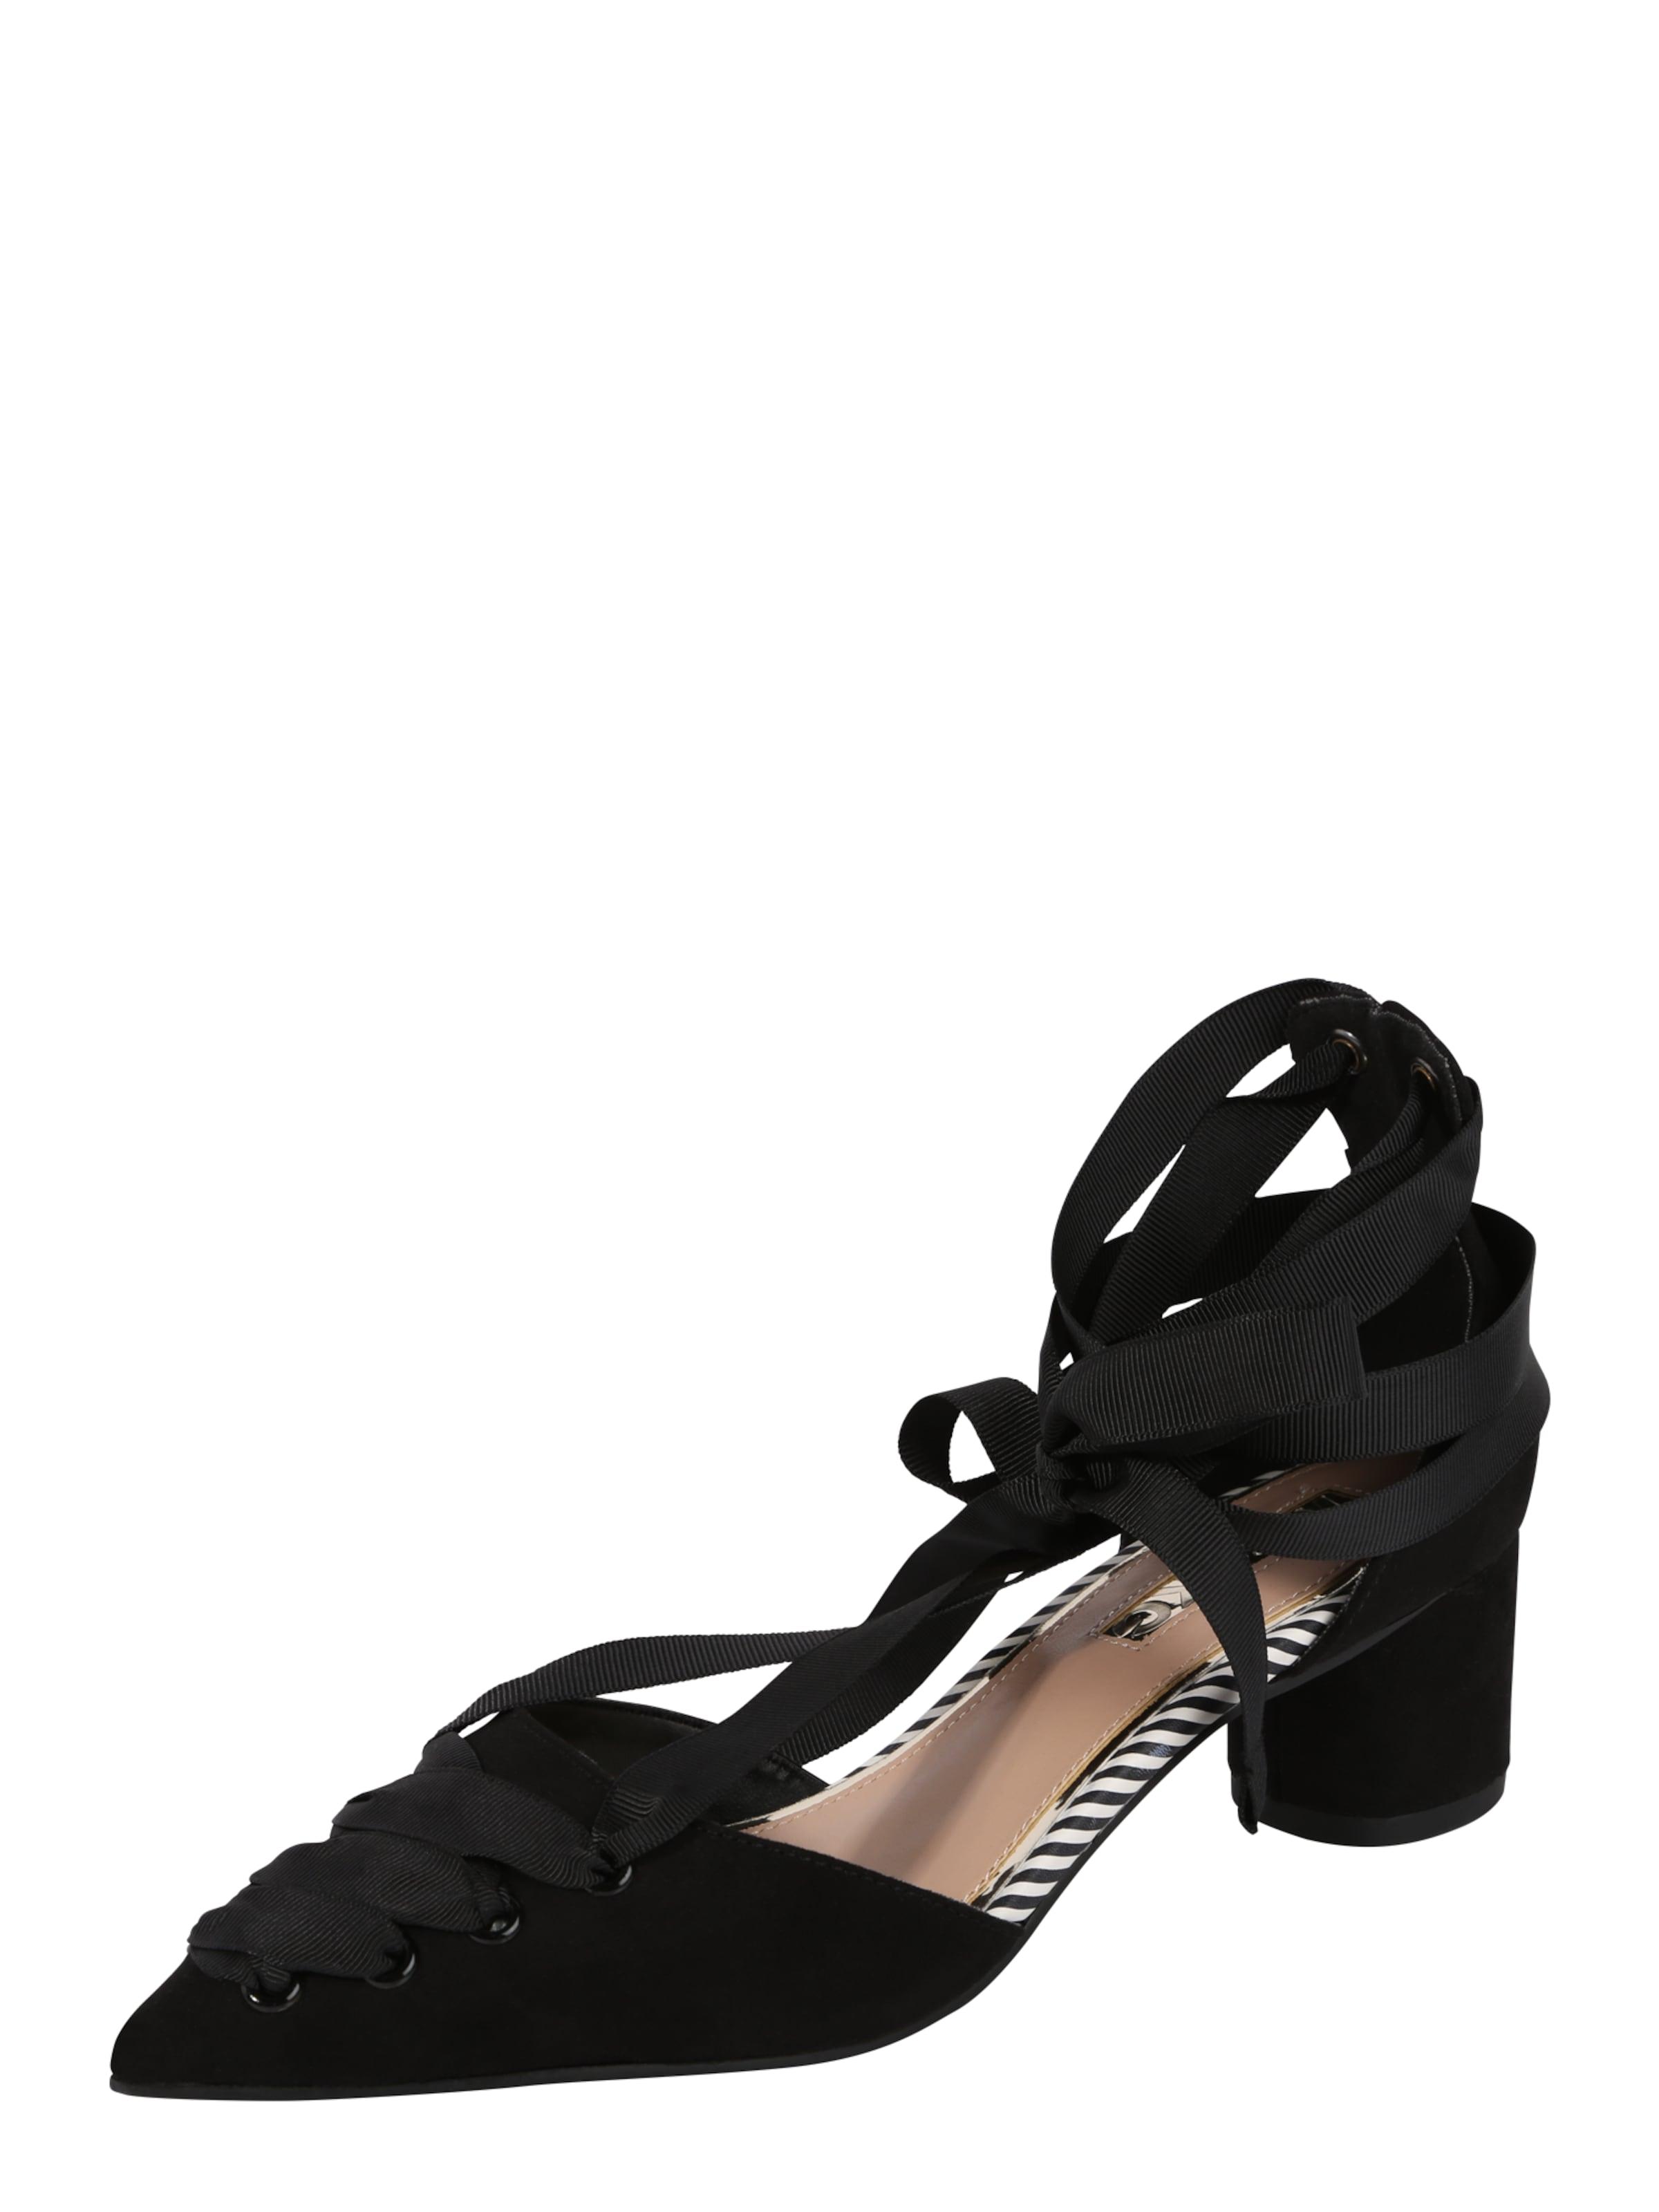 Miss KG Pumps APRIL Verschleißfeste billige Schuhe